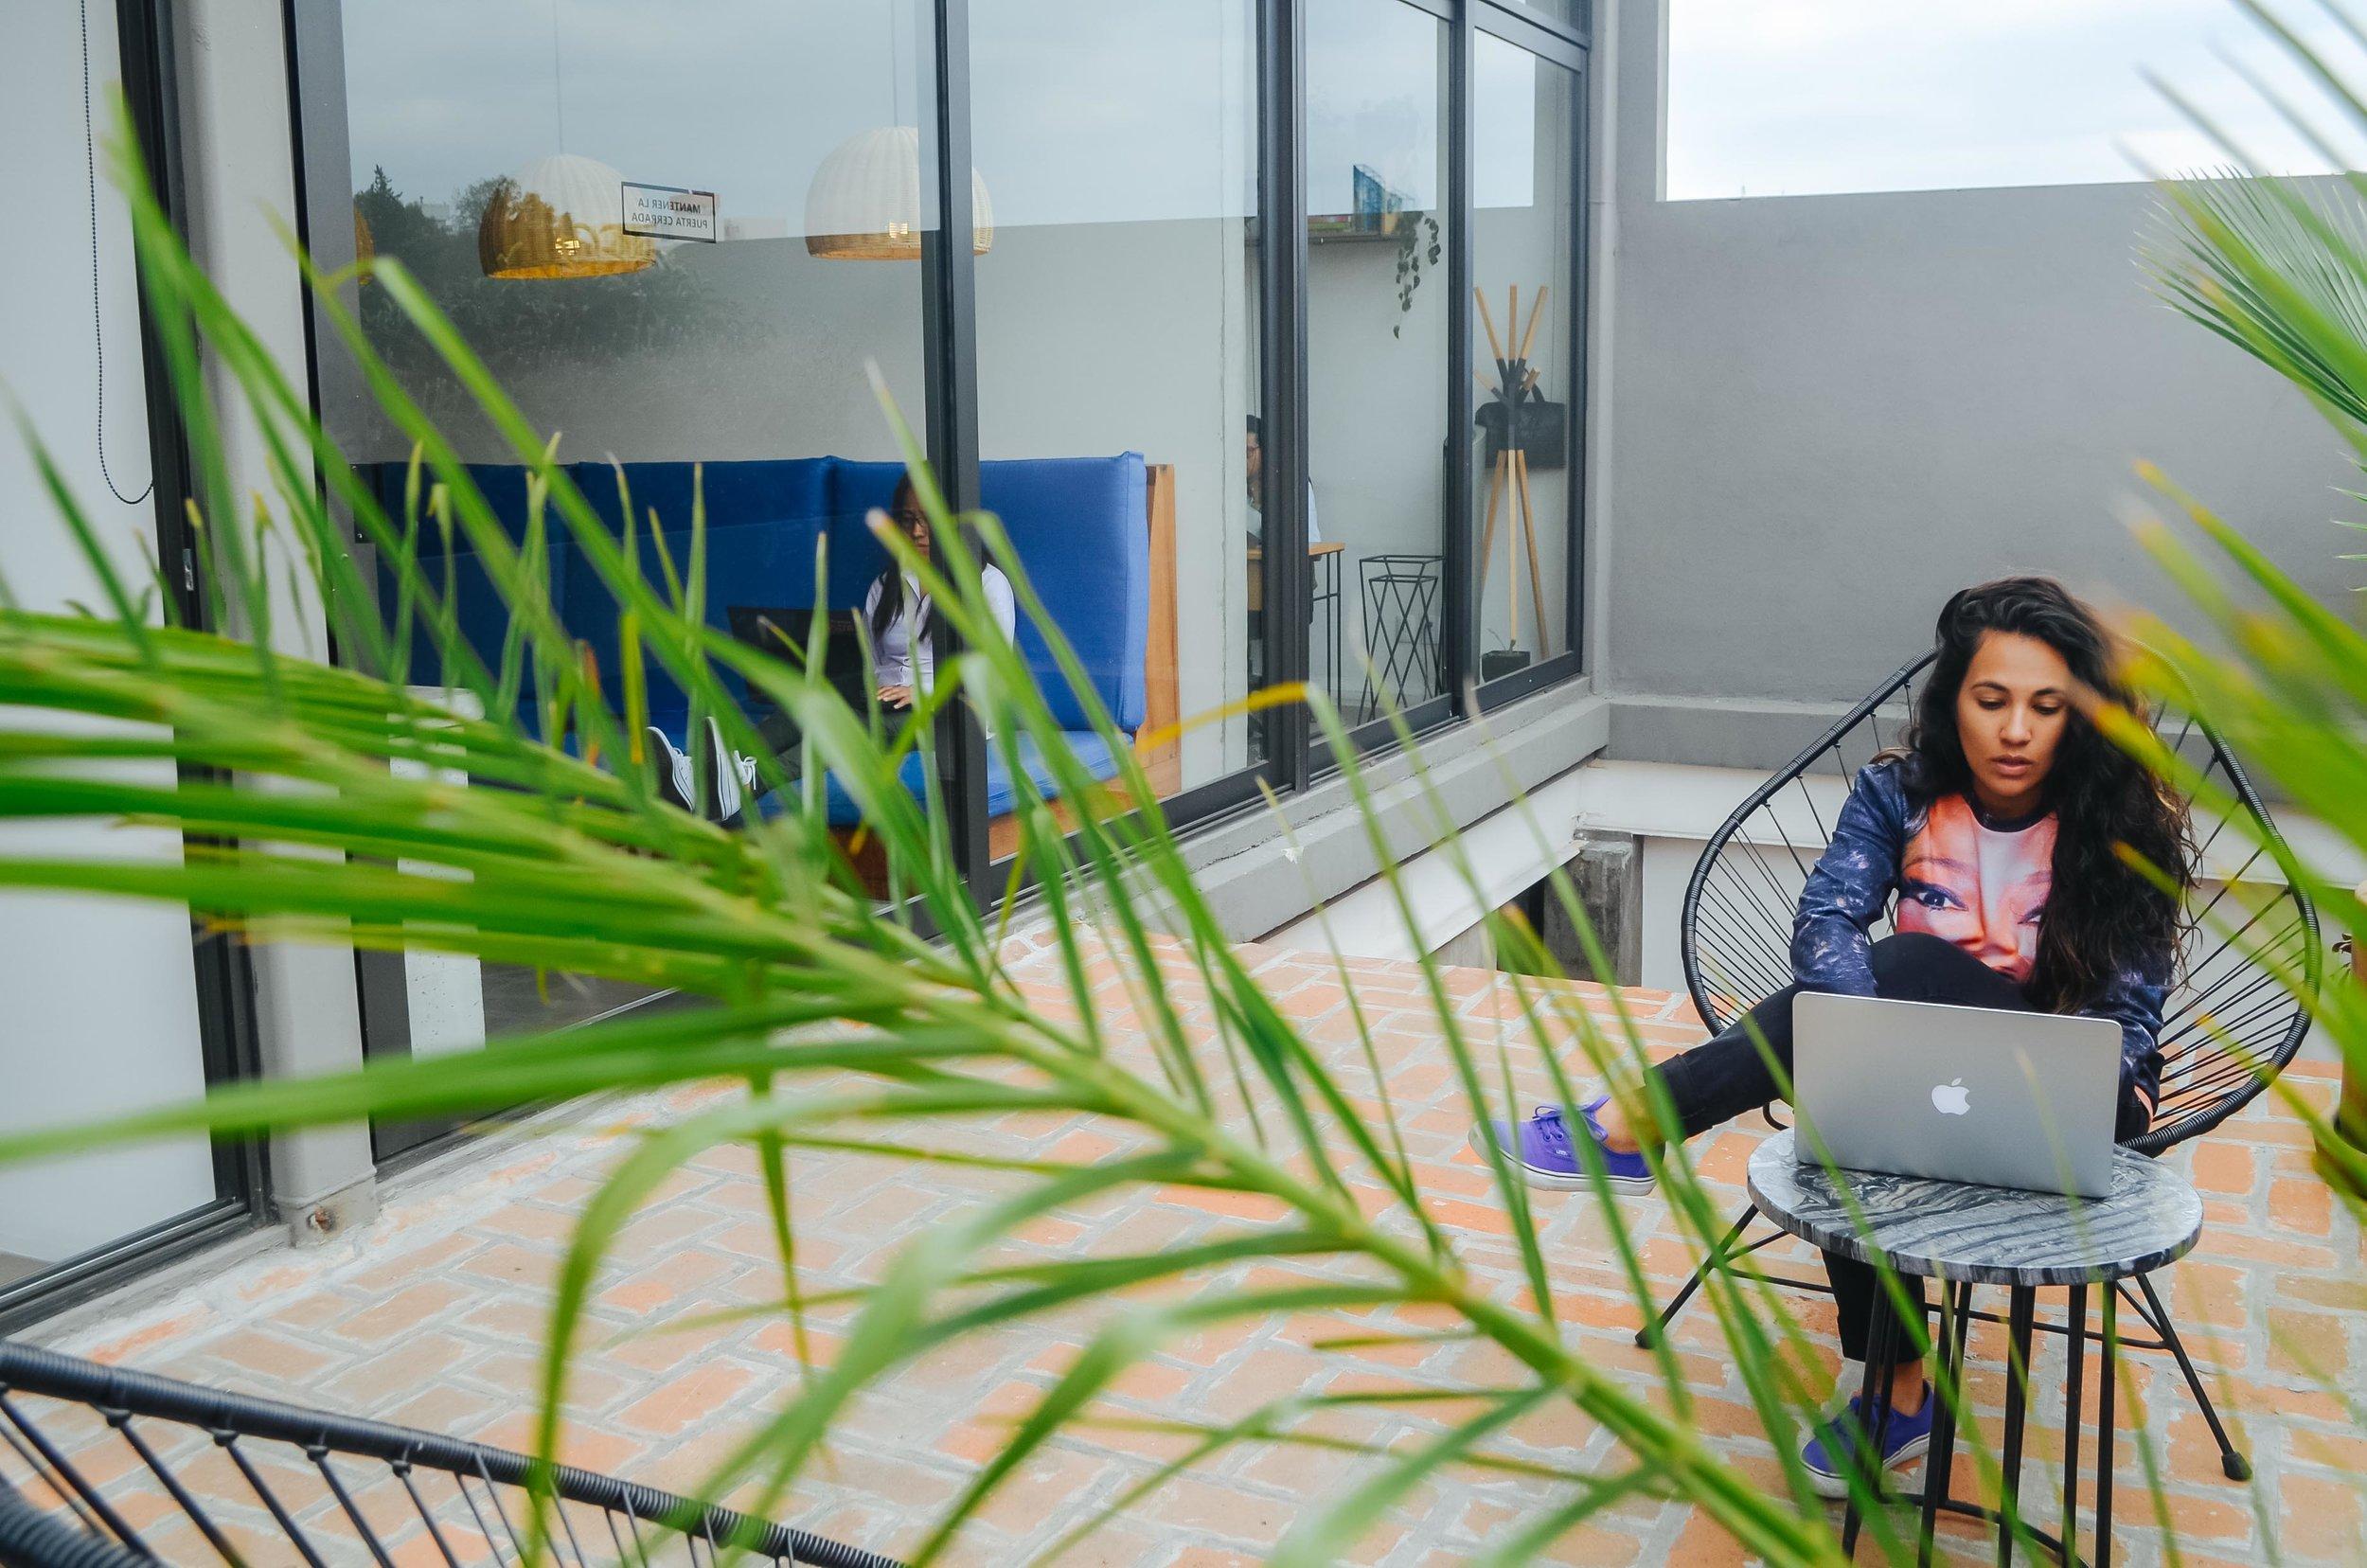 At Coworking Space: Publico Trabajo in Mexico City